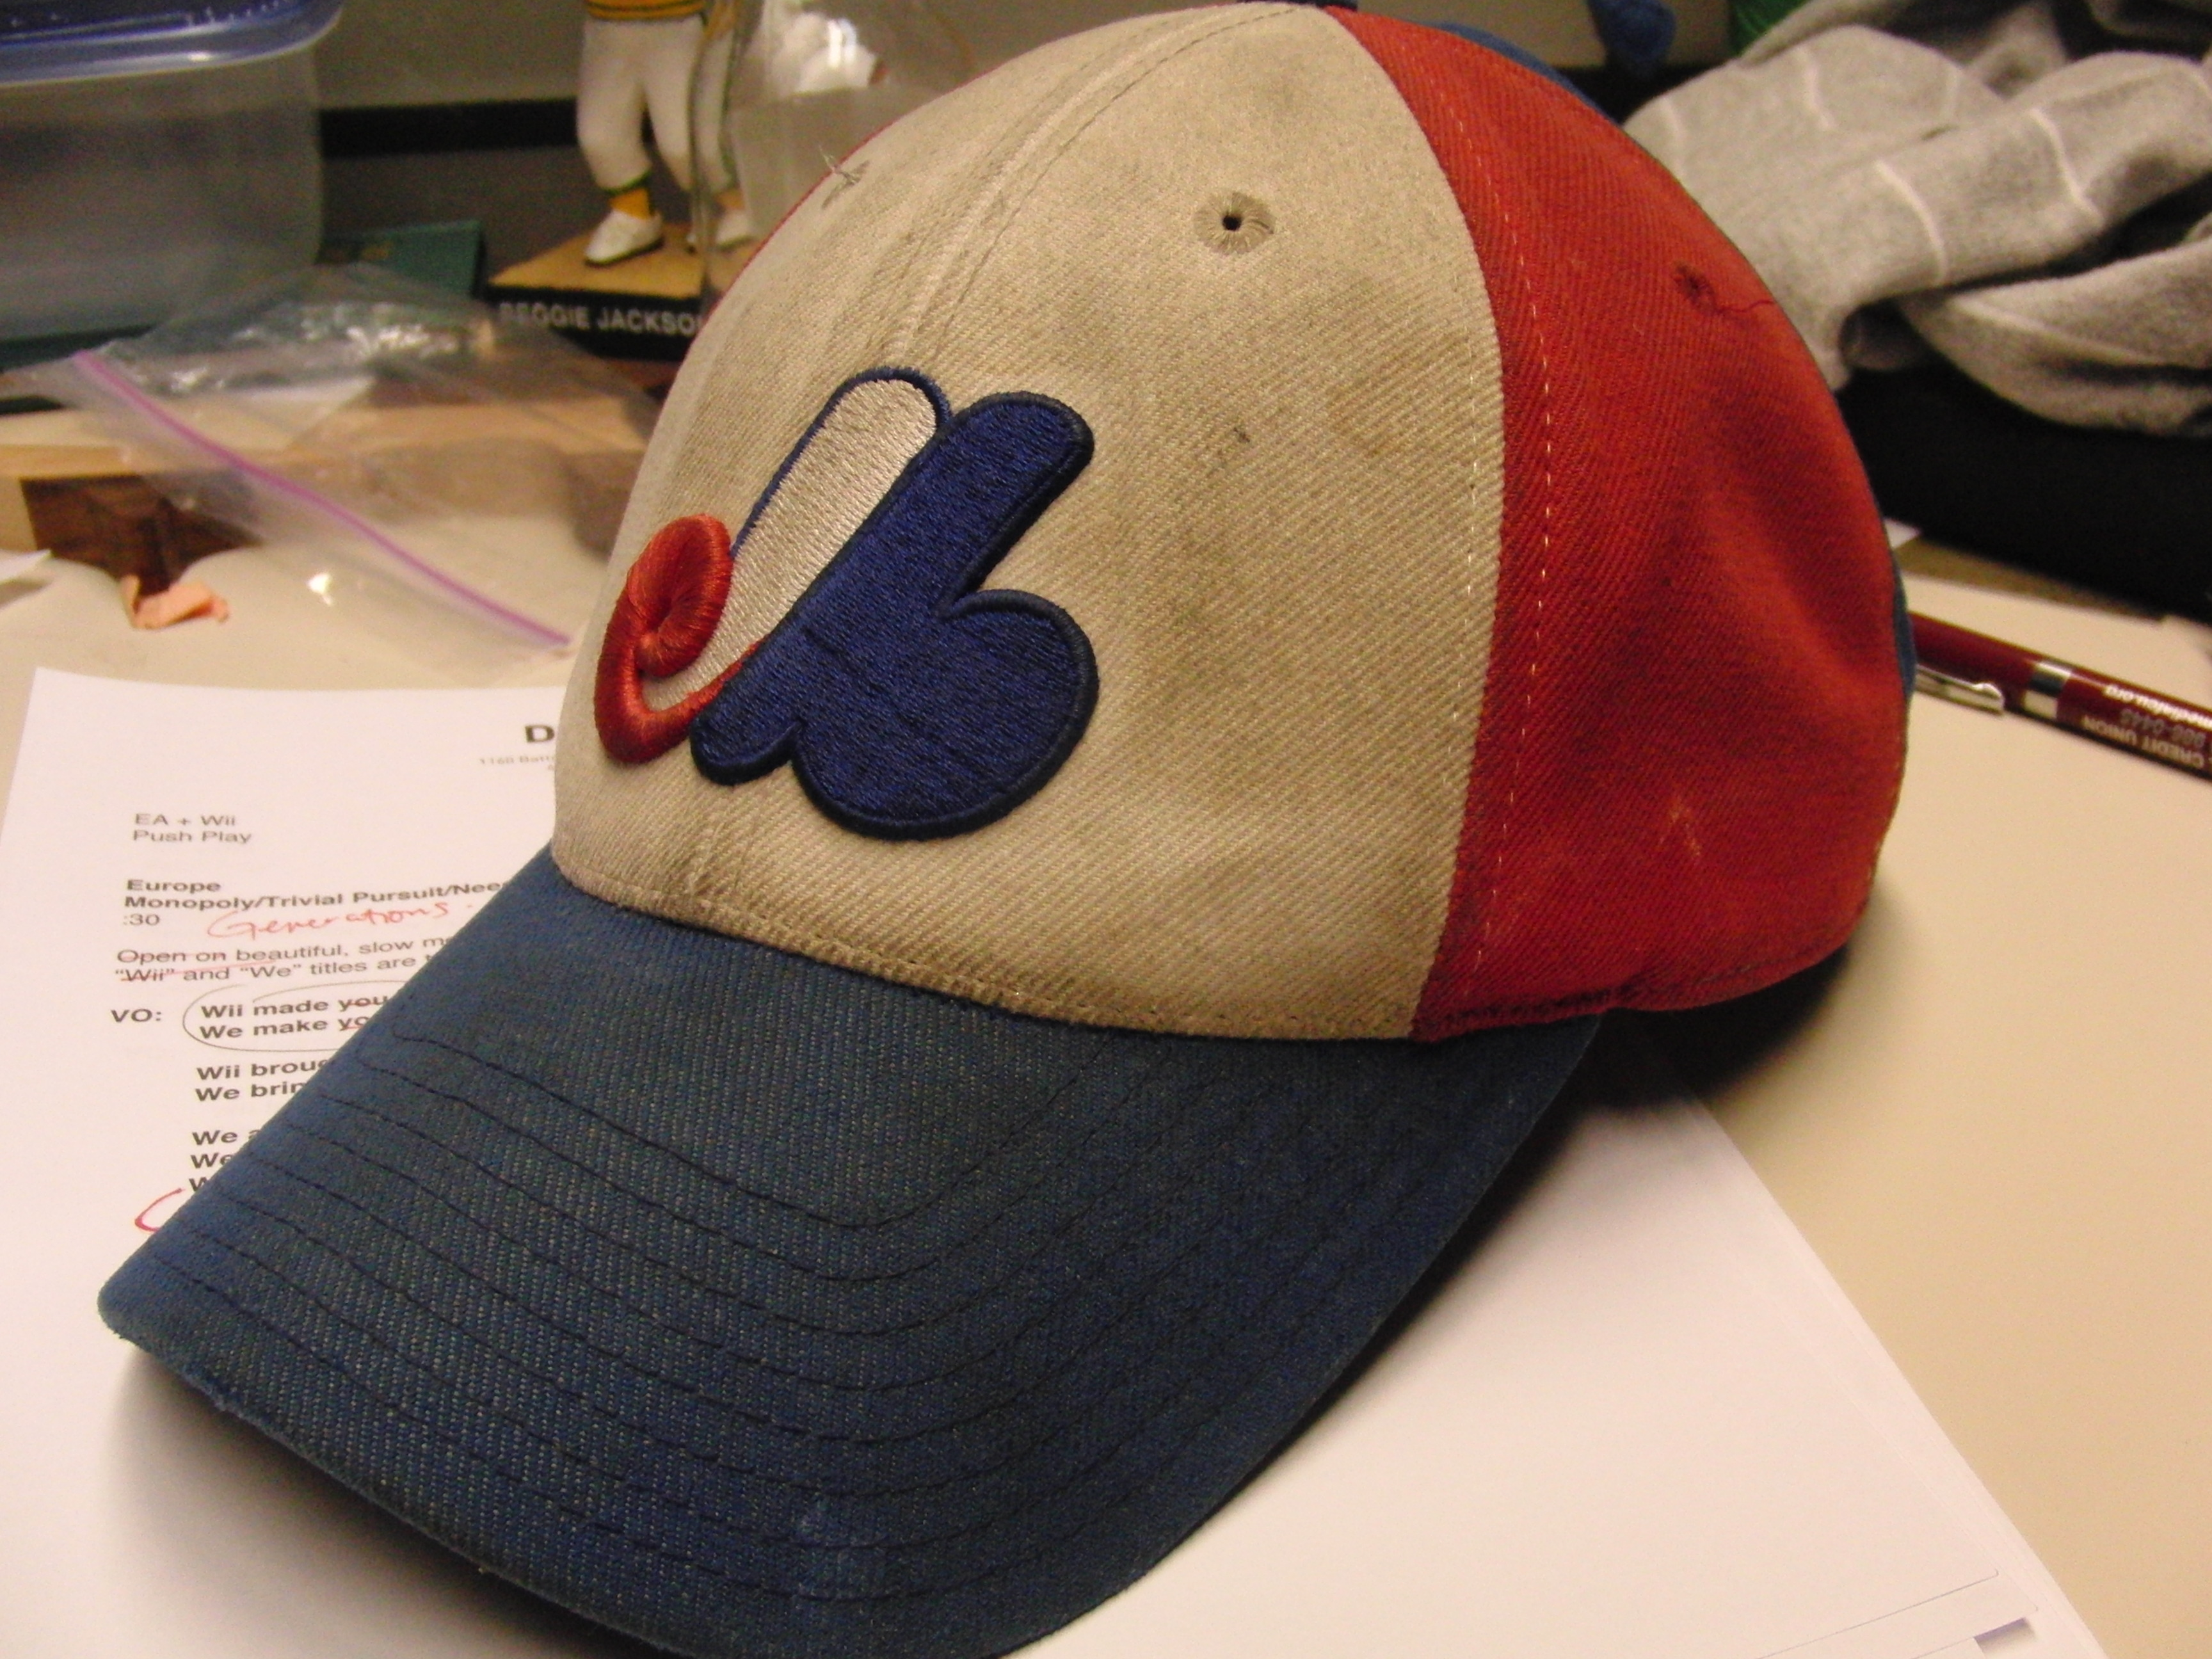 File Montreal Expos baseball cap 1969-1991.jpg - Wikimedia Commons 266a28ef22d